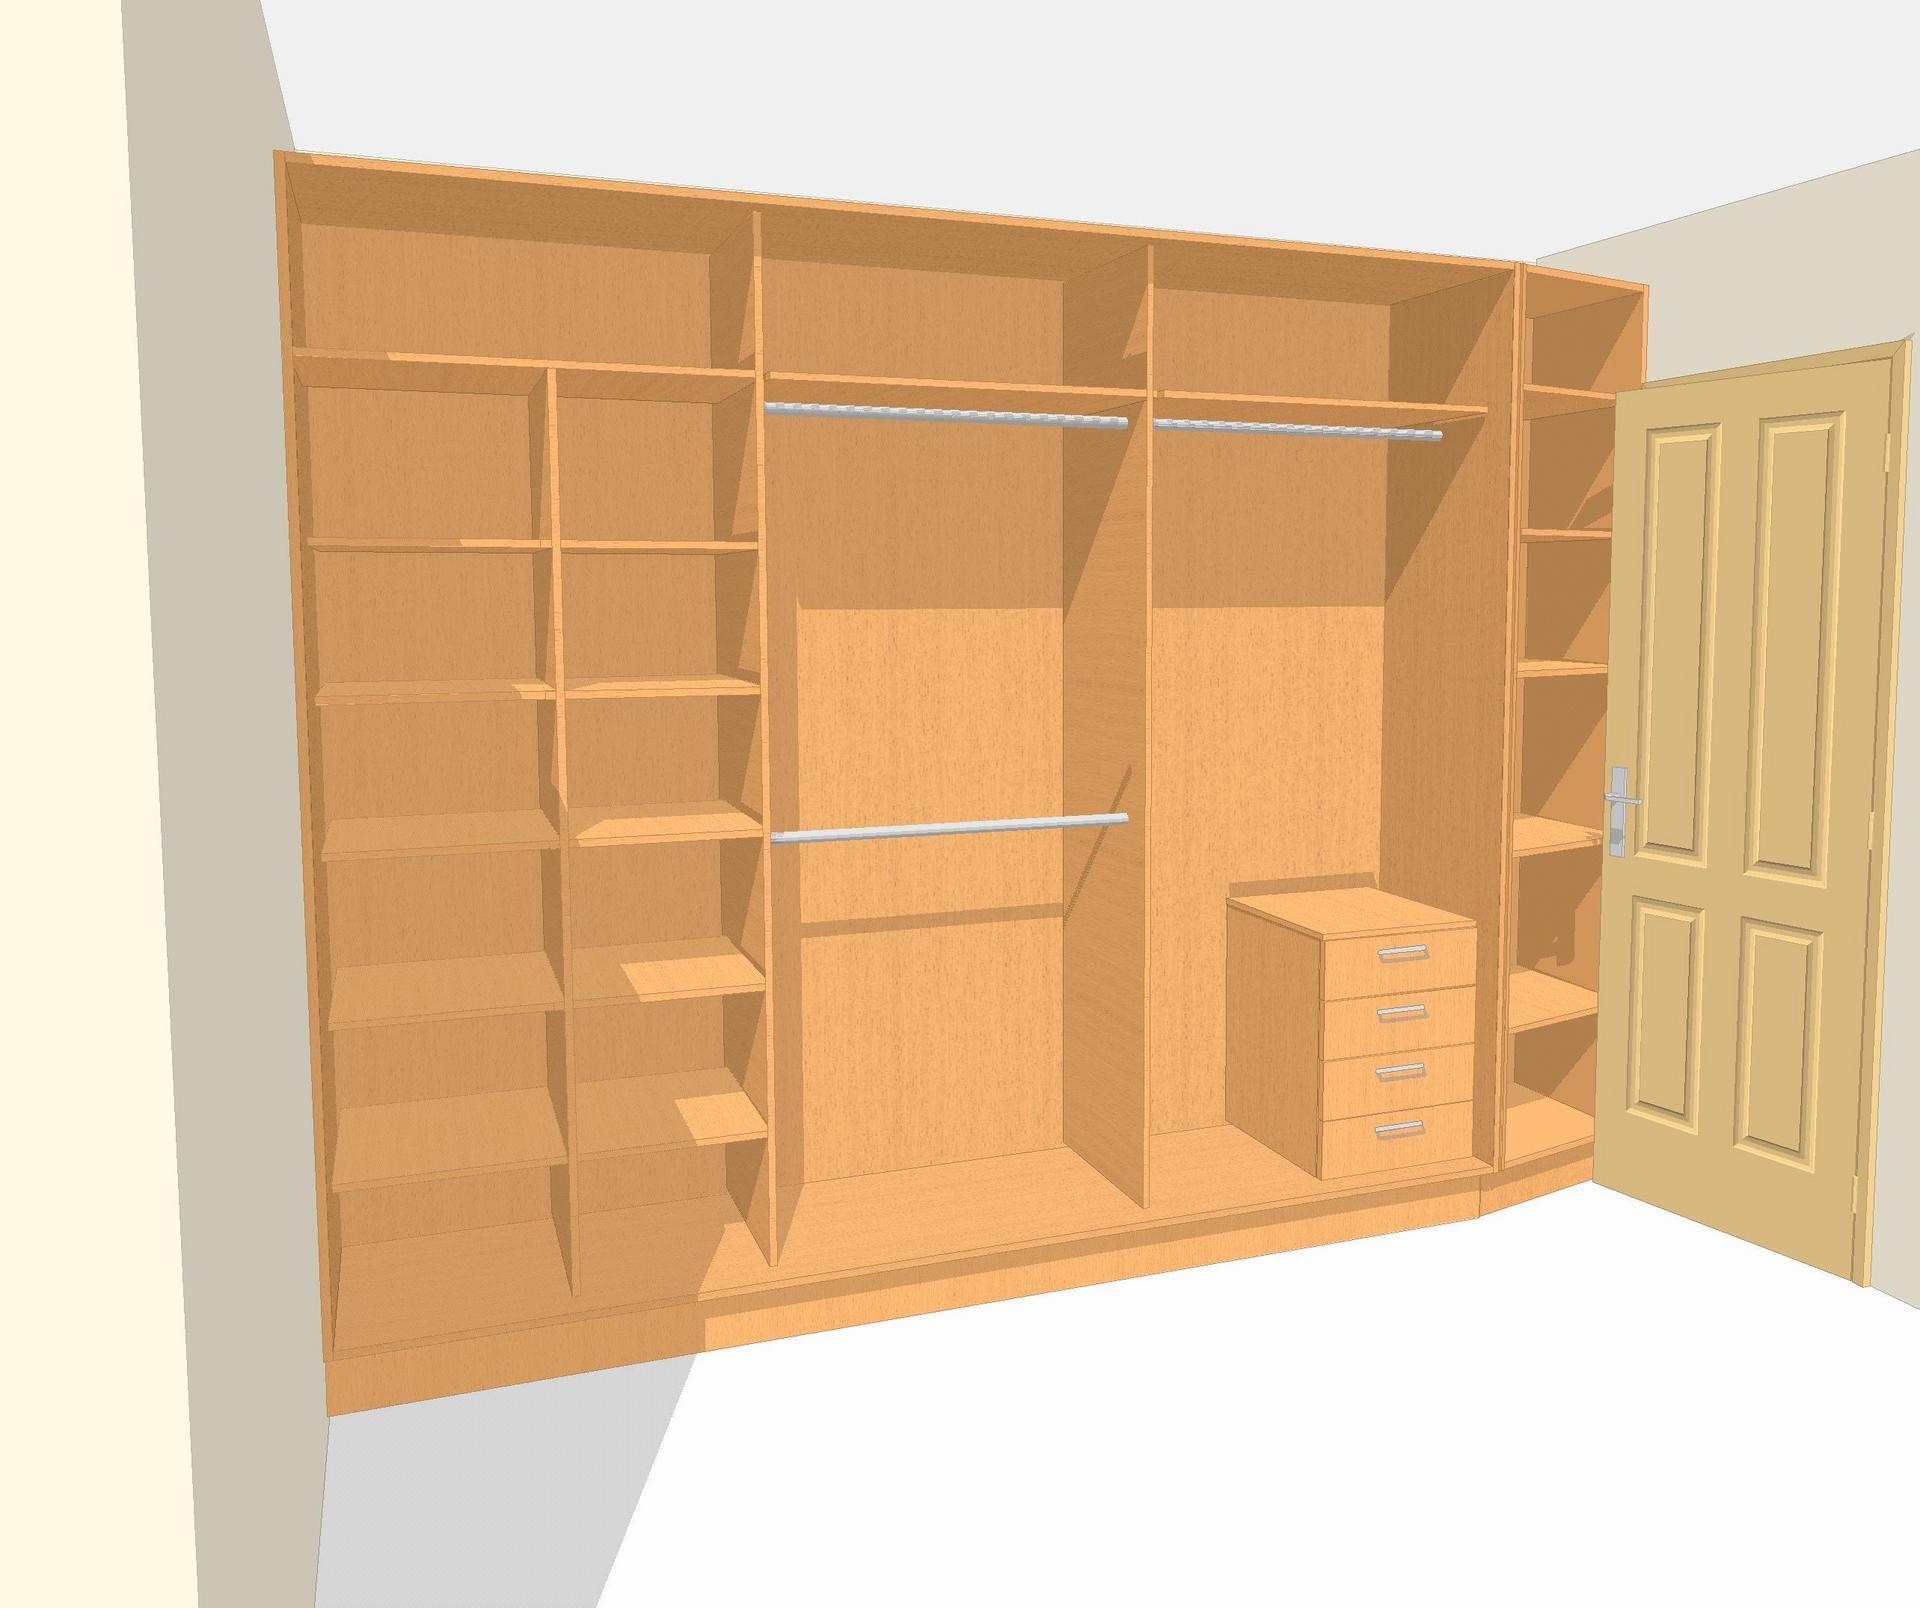 Шкаф в купе своими руками в домашних условиях фото и чертежи